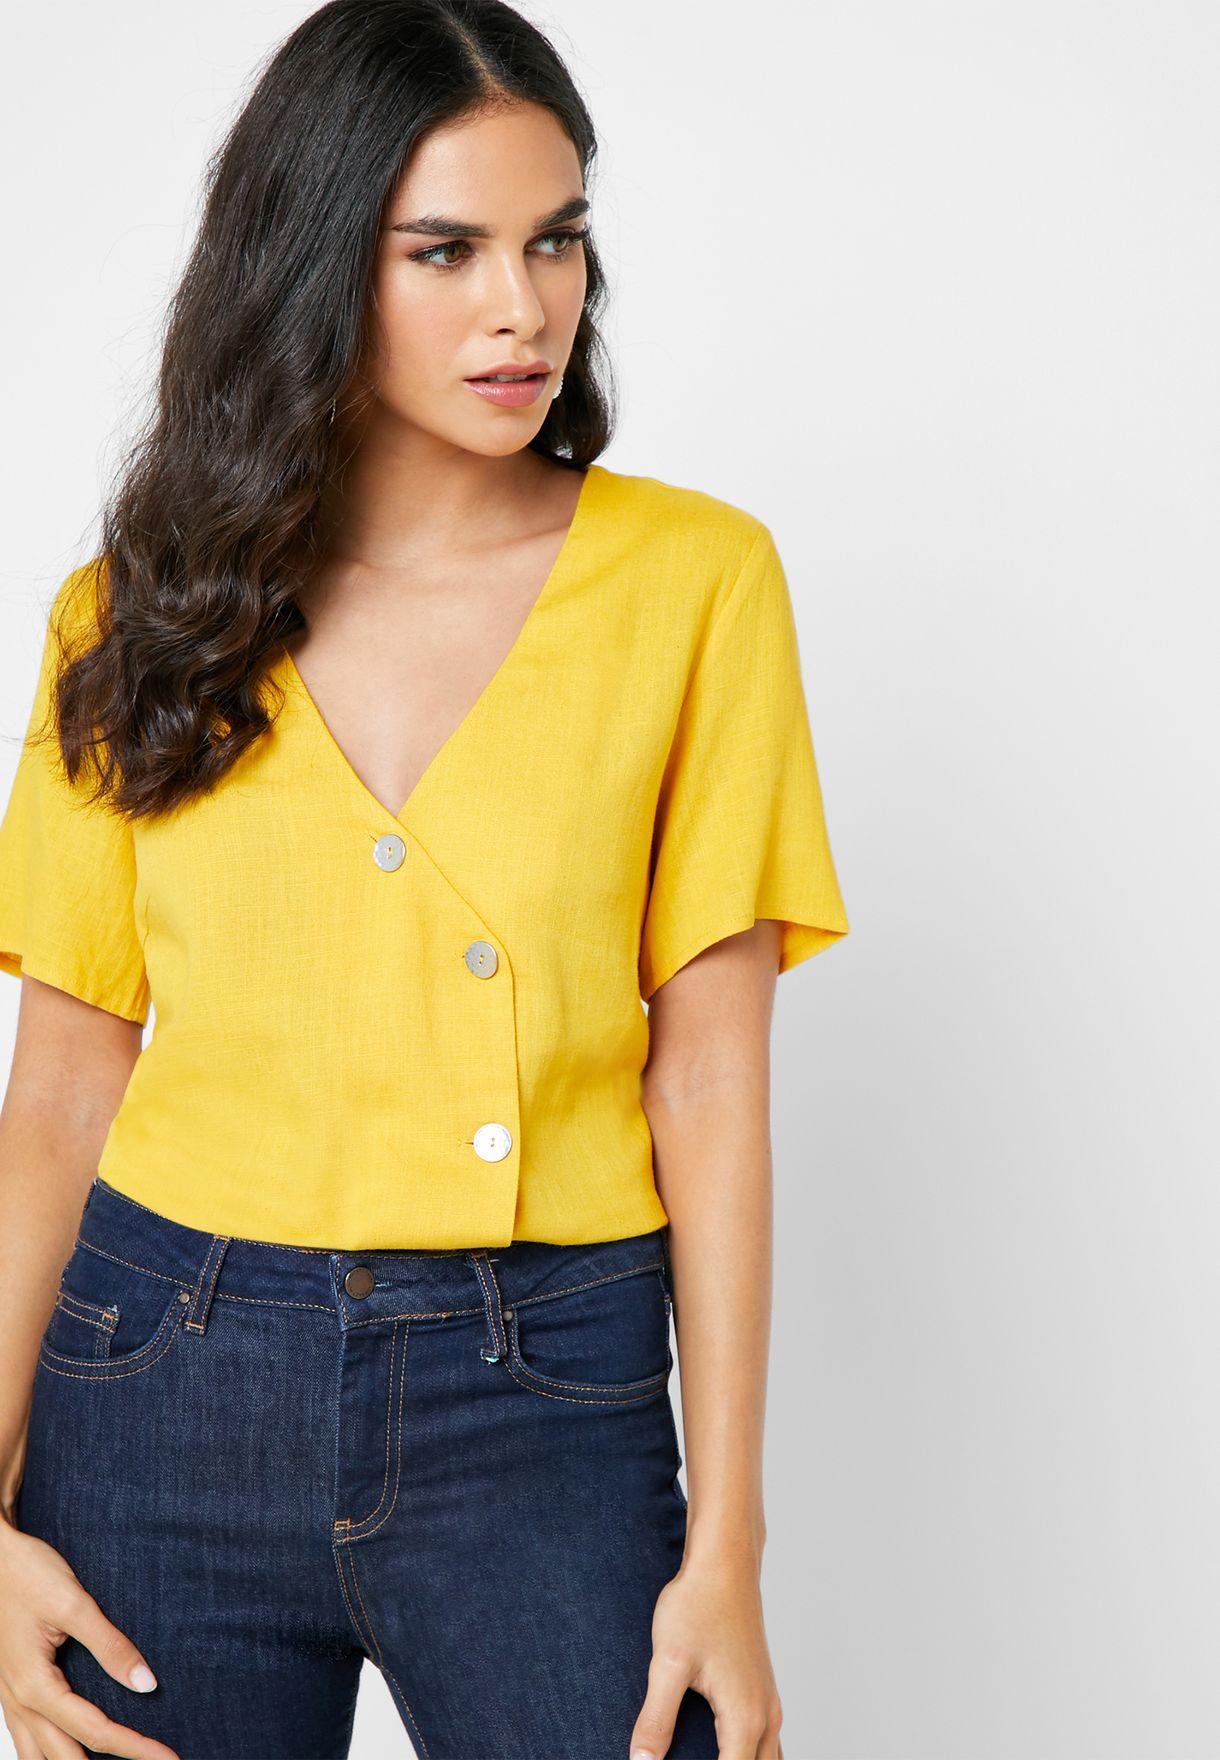 V-Neck Button Down Shirt